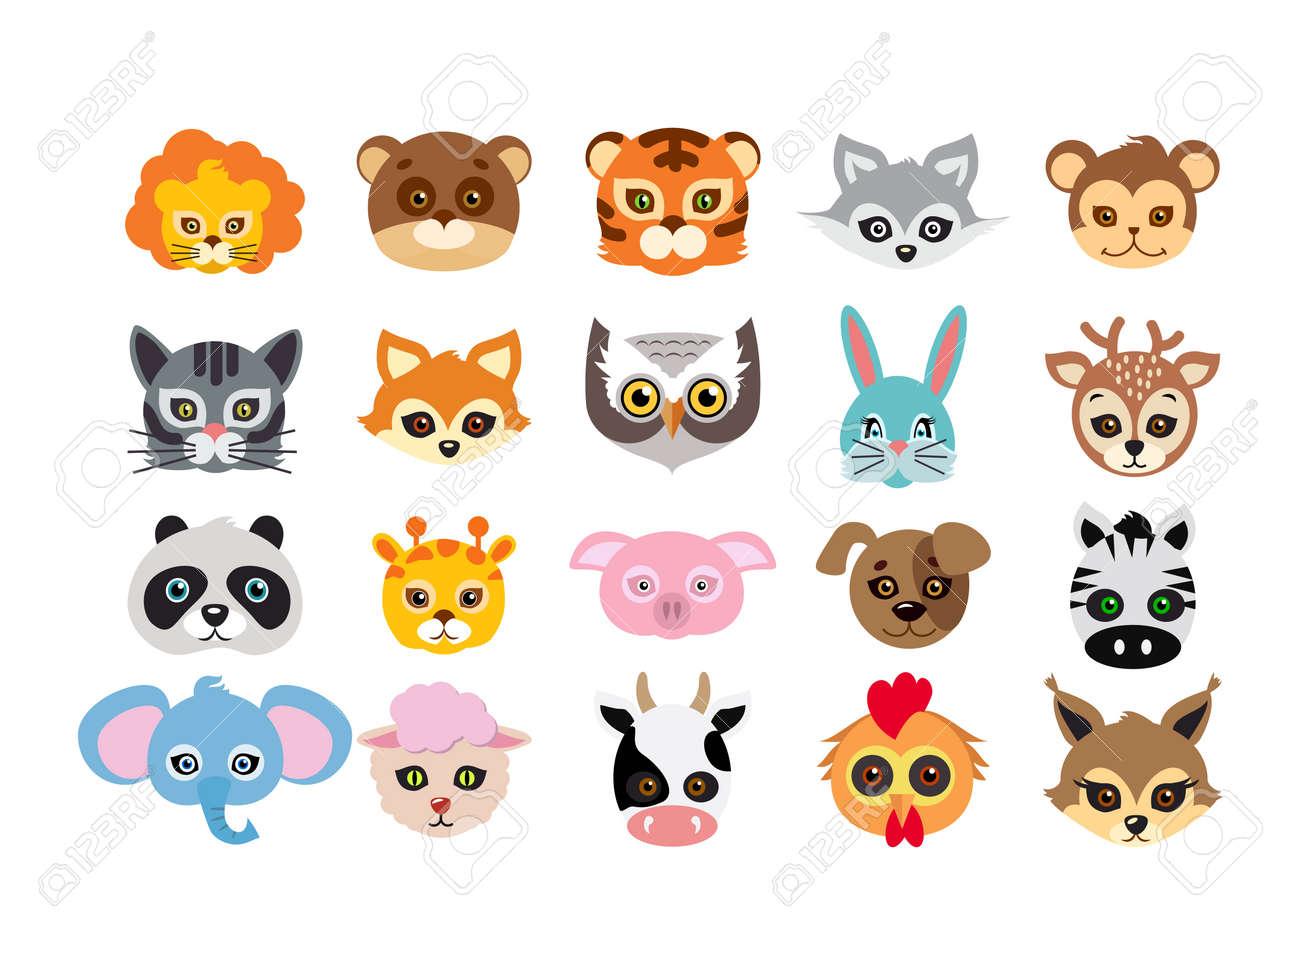 Collection of different animal masks on face. Mask of lion, bear, tiger, rabbit, monkey, cat, fox, owl, hare, giraffe, deer, panda, pig dog zebra elephant sheep cow squirrel in flat design - 72891105